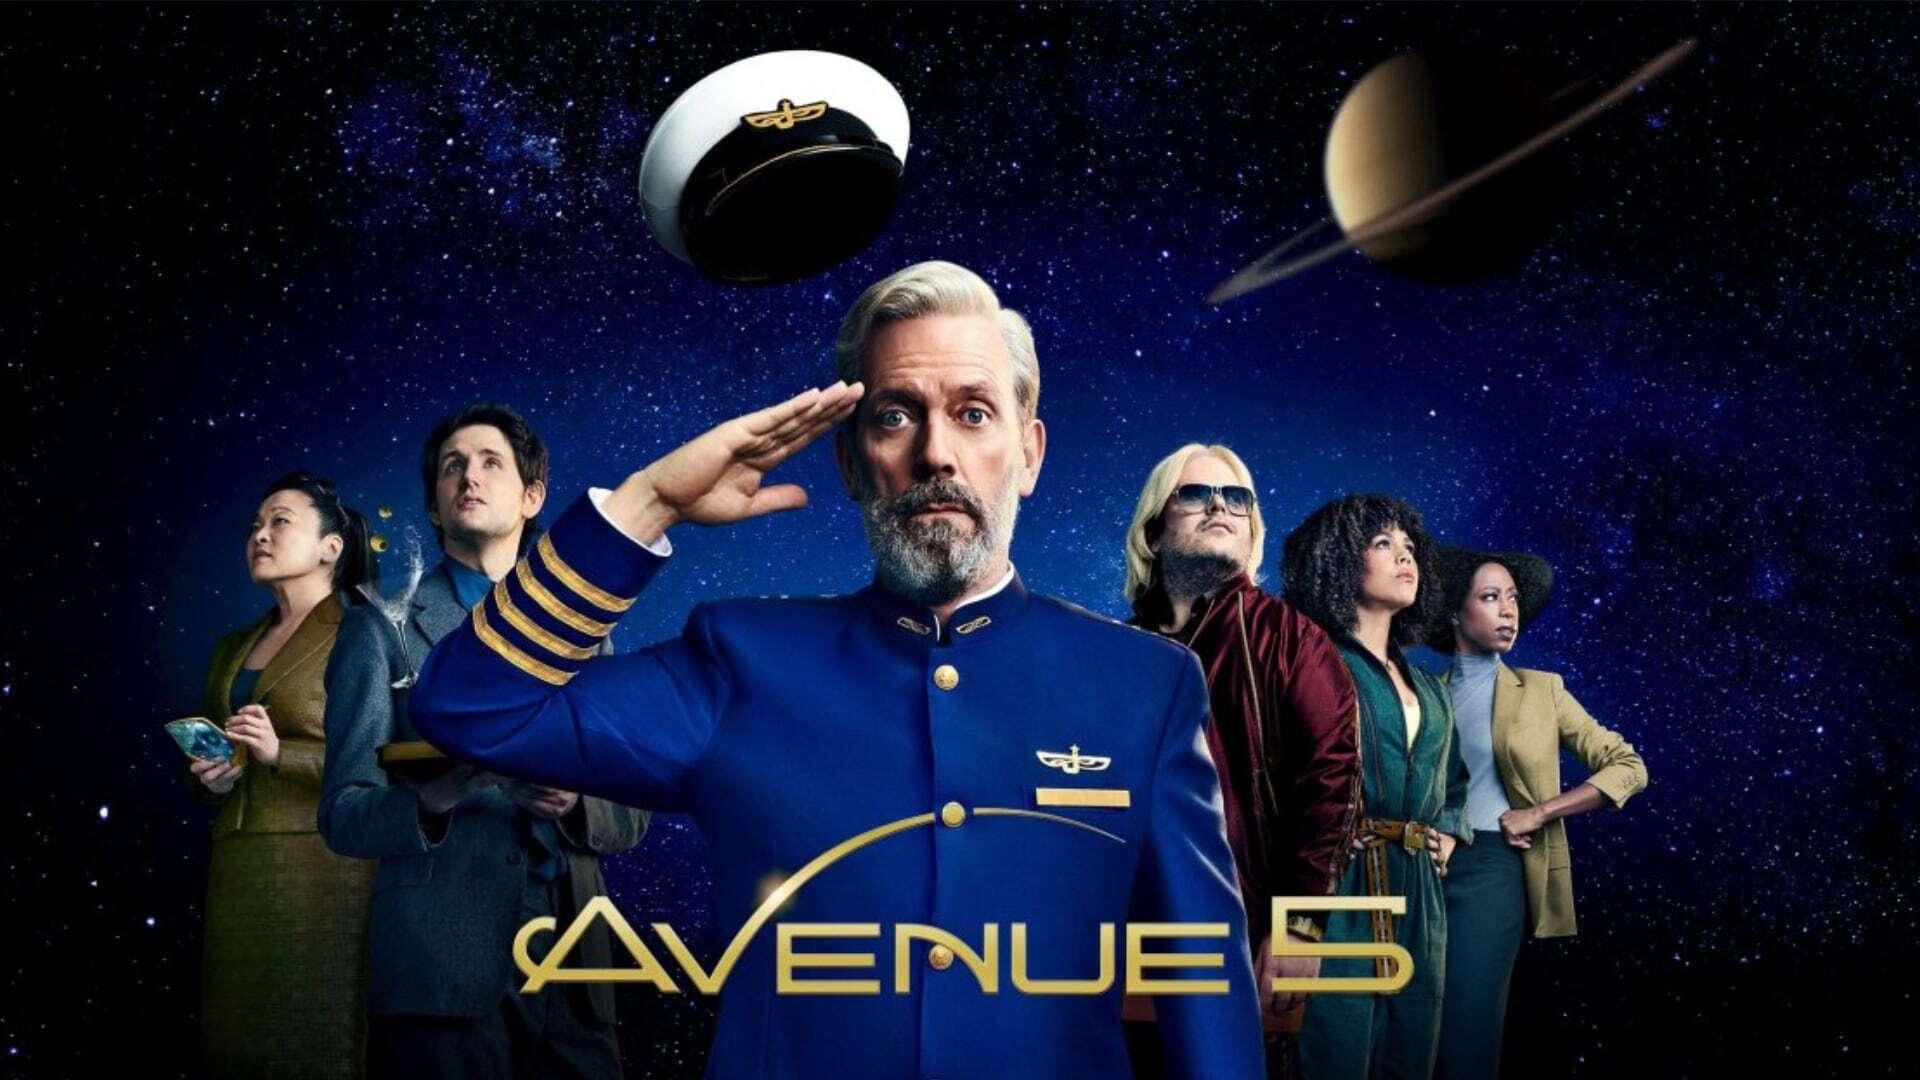 Avenue 5, la serie de Iannucci en HBO